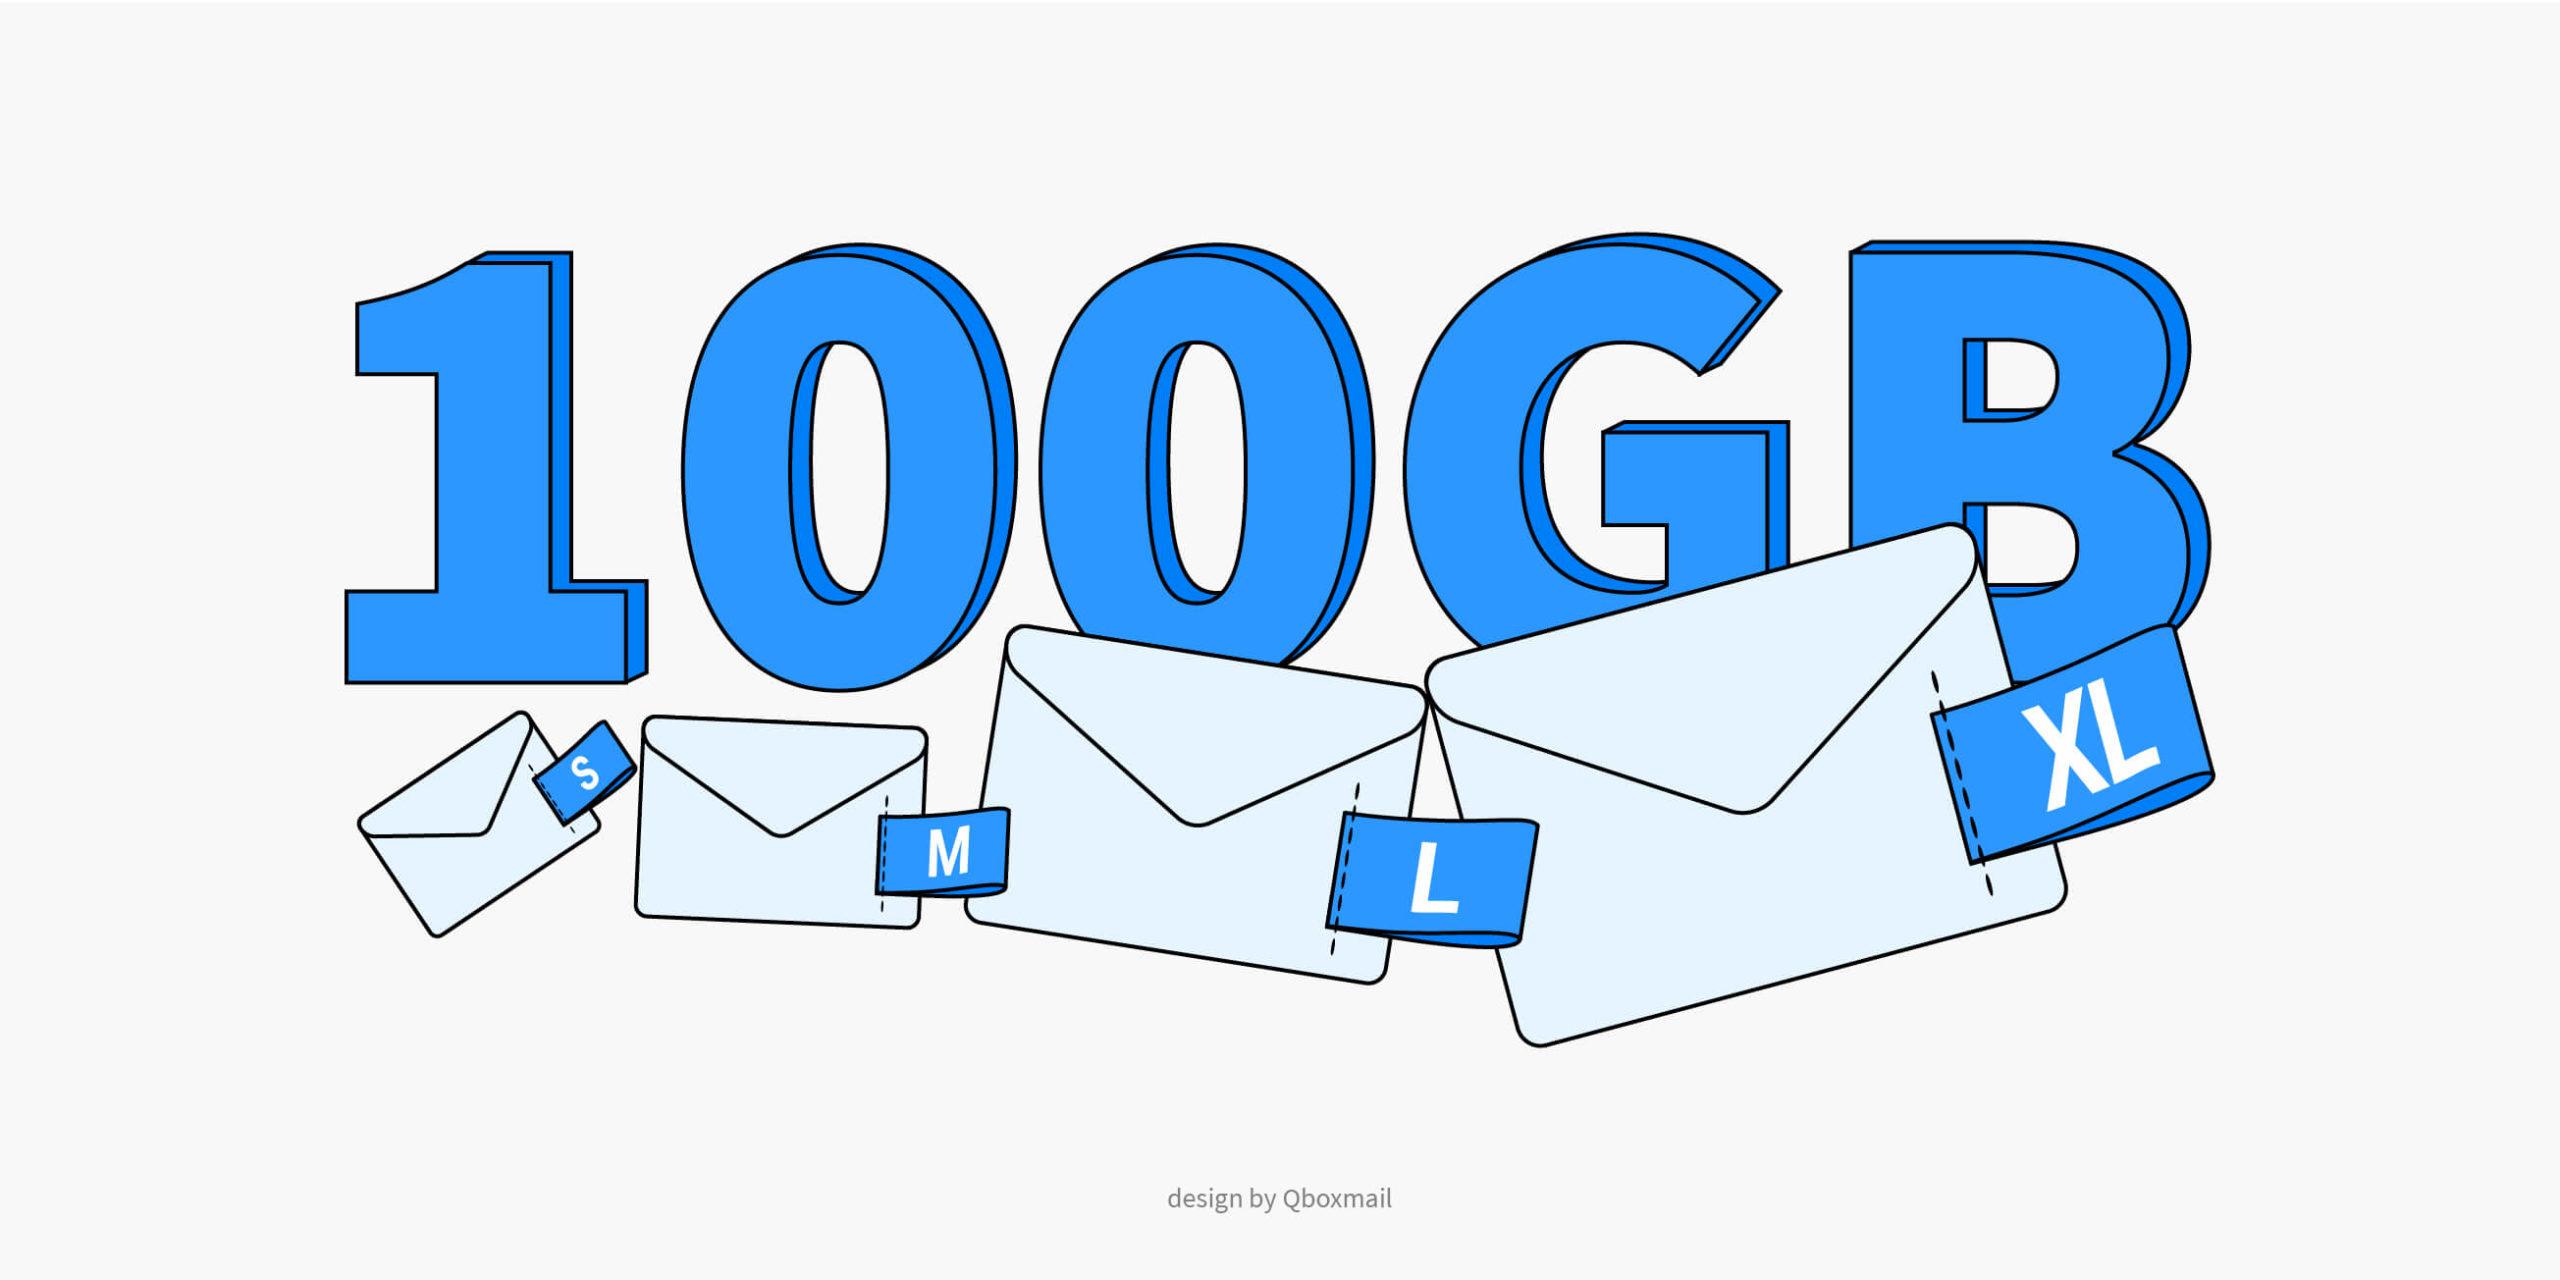 Caselle email da 100GB